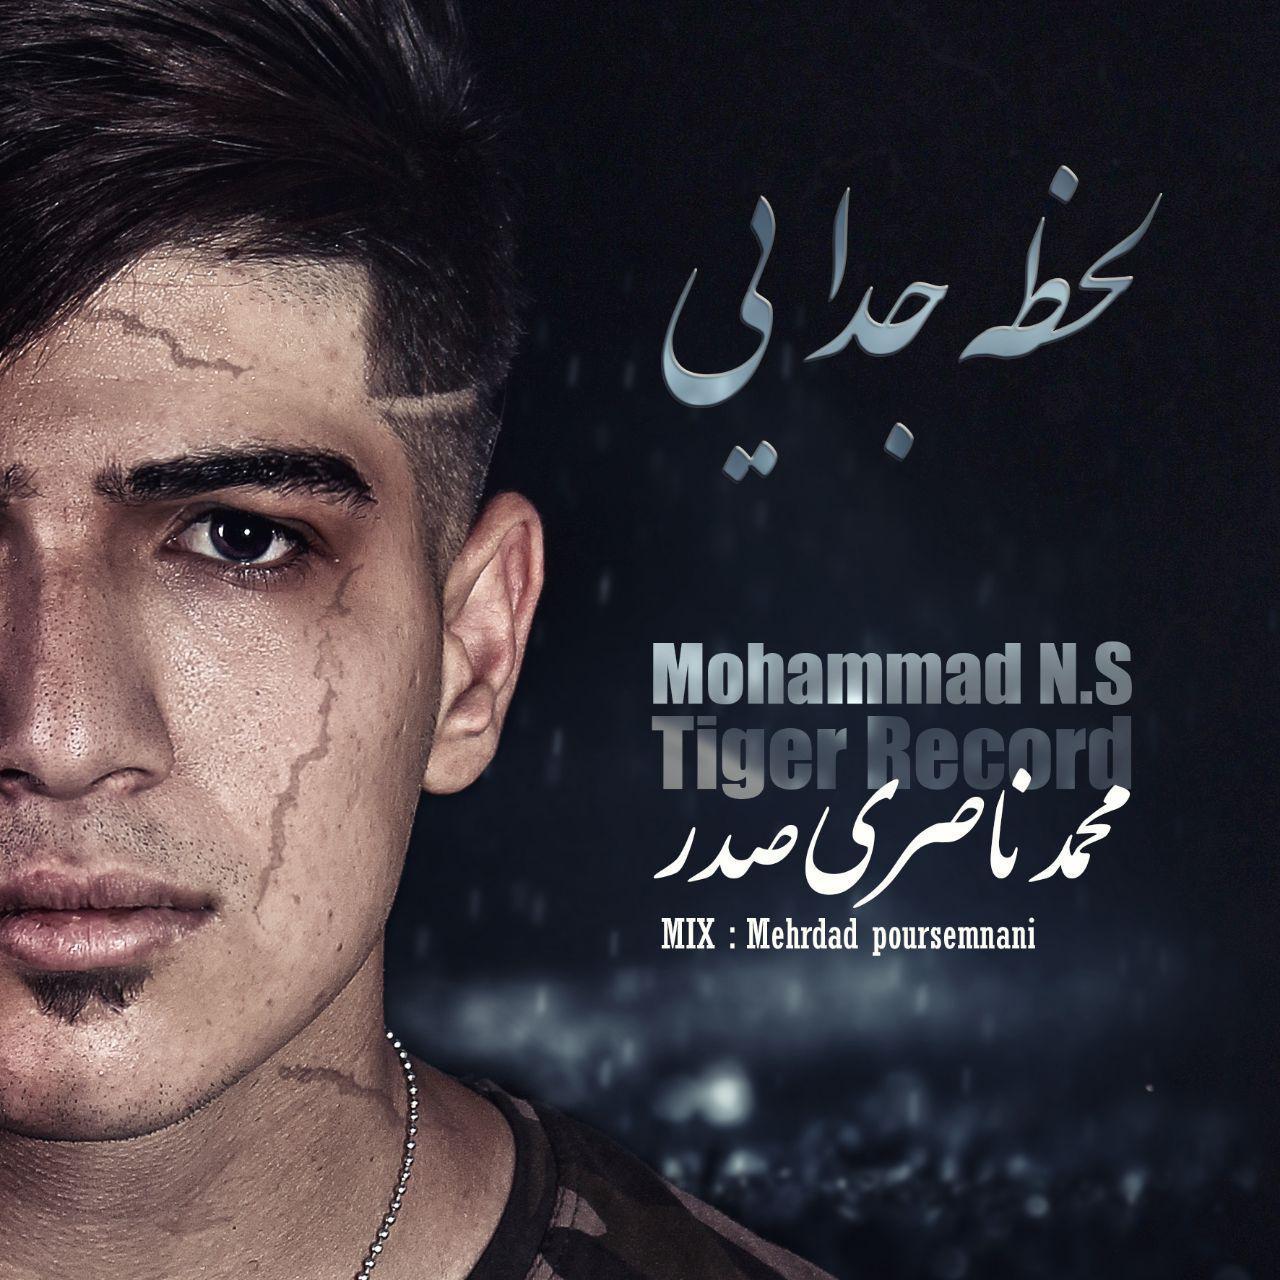 Mohammad Ns – Lahze Jodayi